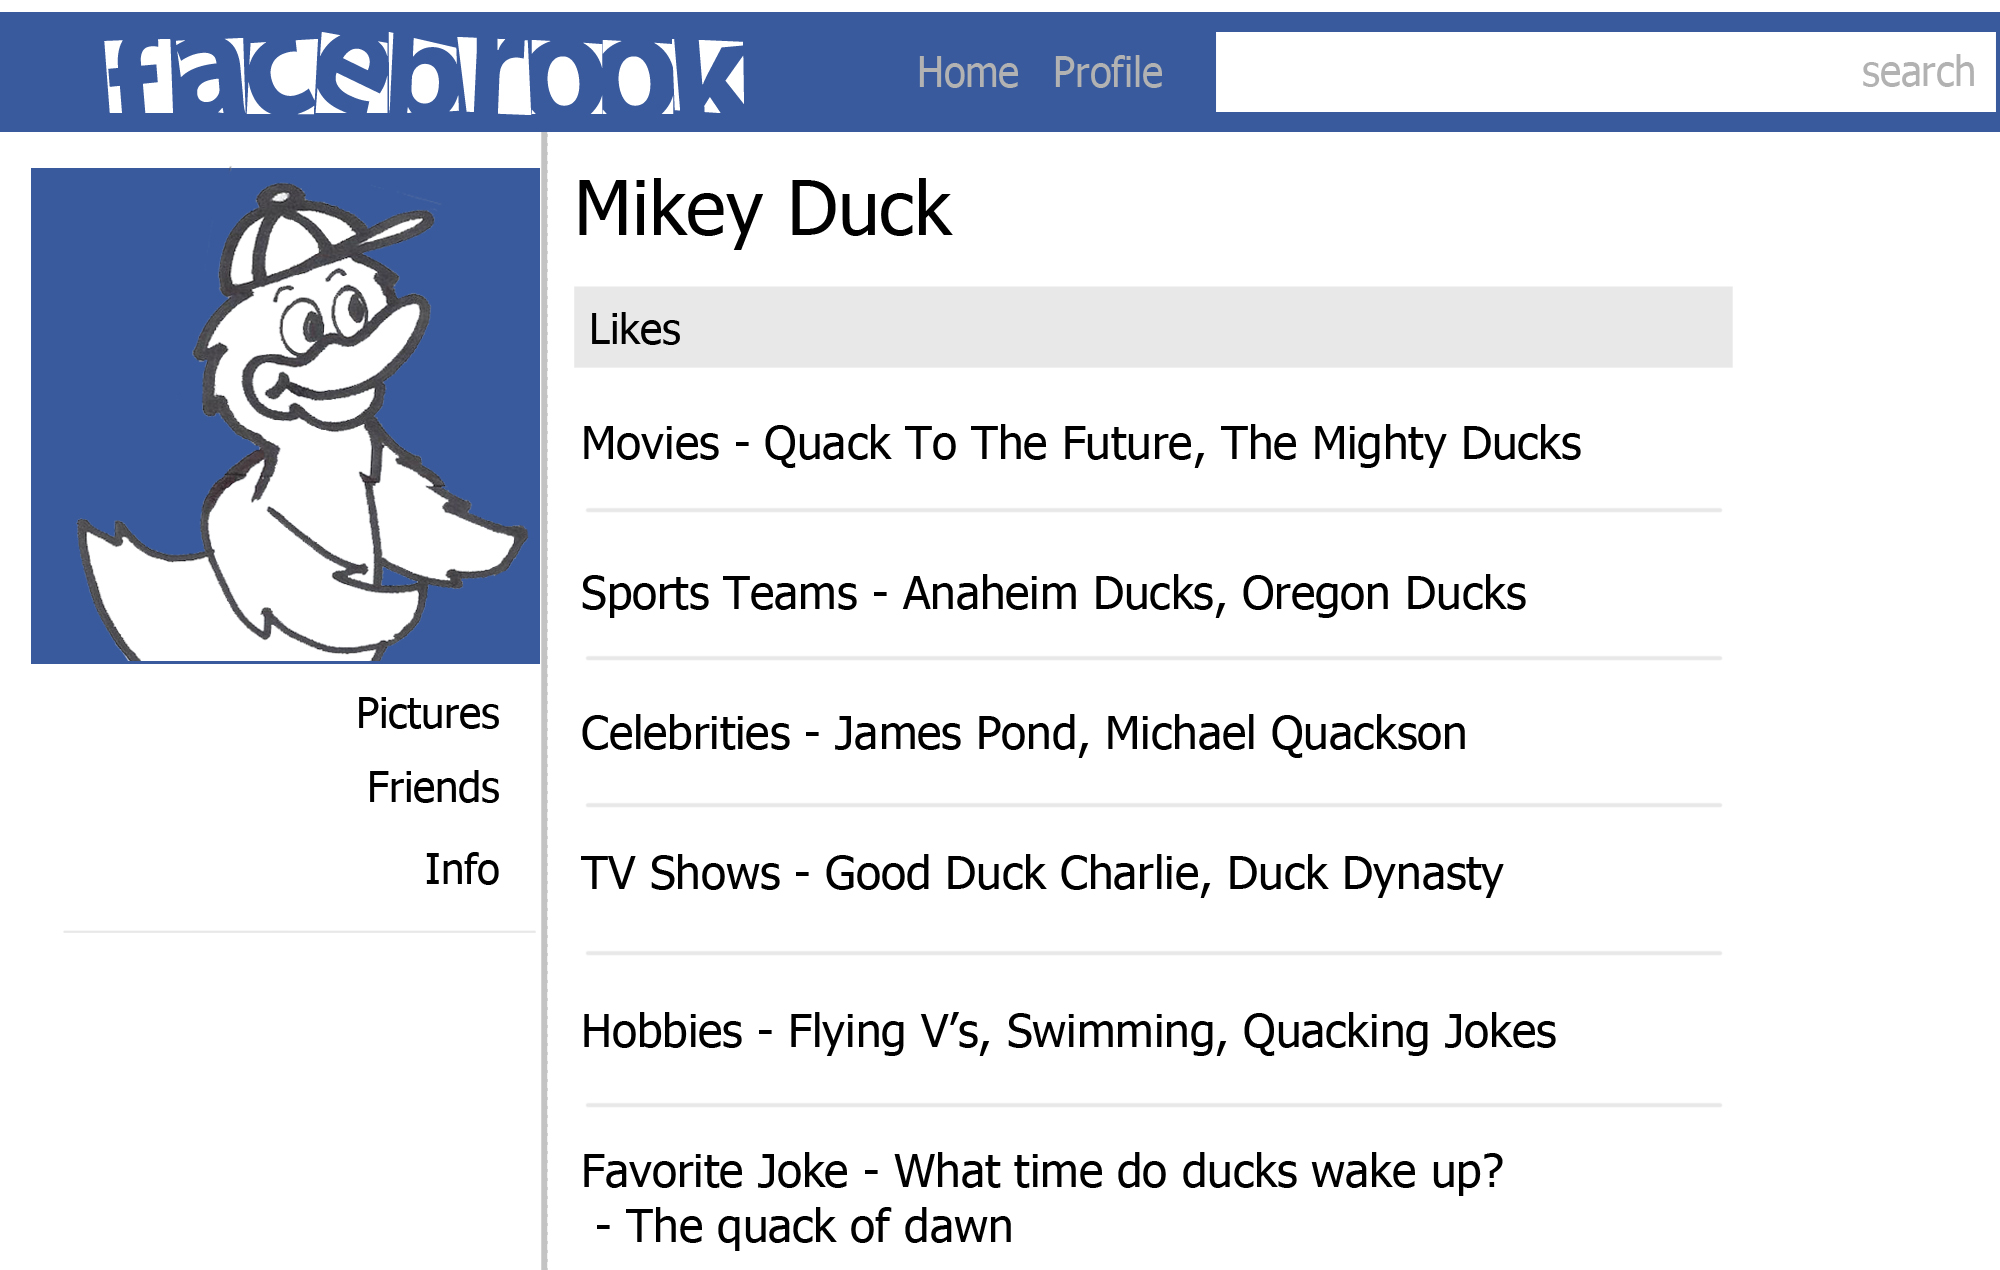 Mikey Duck Profile color